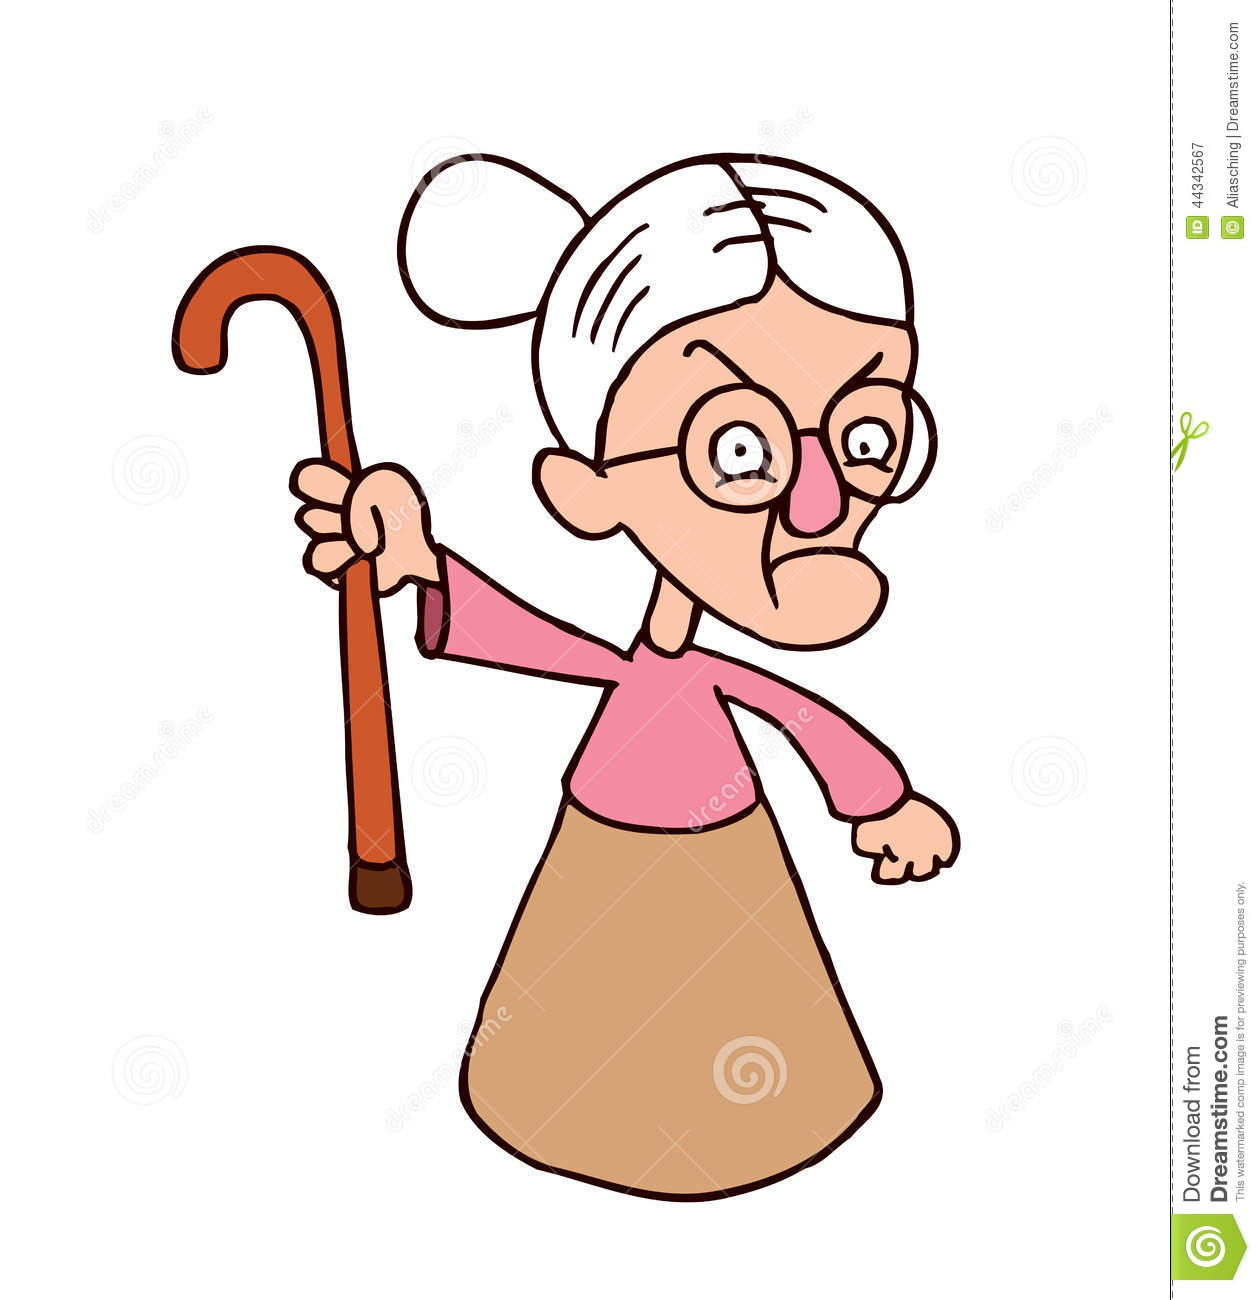 1411 Grandma free clipart.